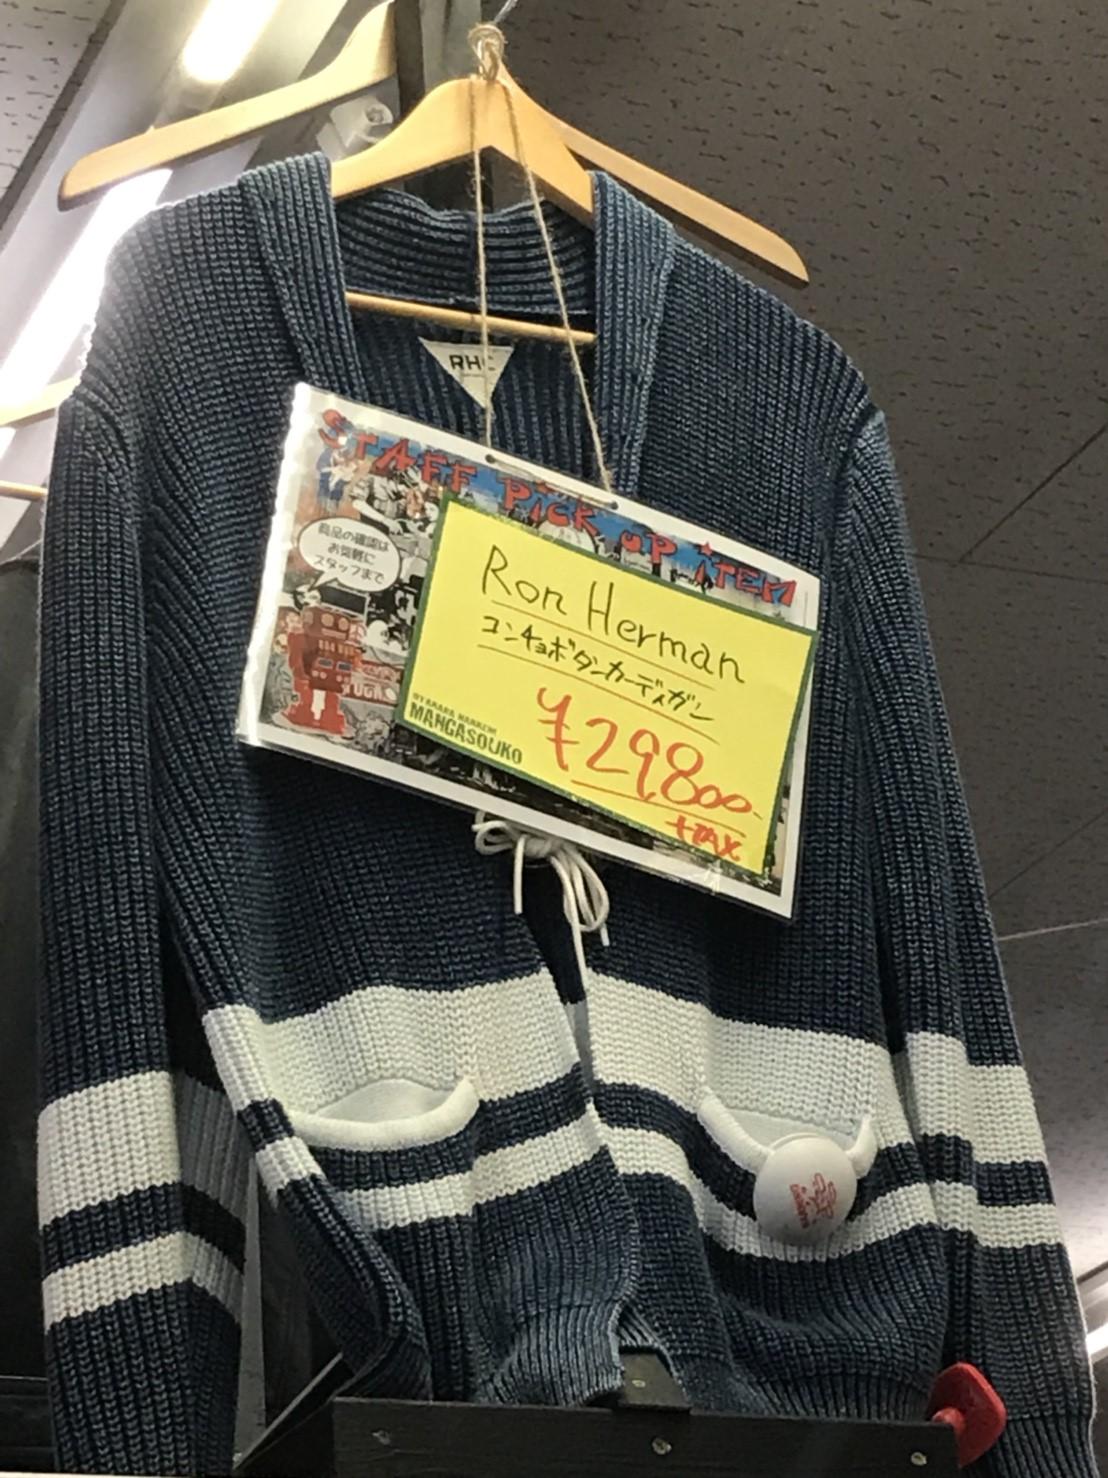 4e02ecb469772 メンズ・レディース・キッズ服が全品20%OFFのお買い得セール開催中です! 対象商品を一部ご紹介しちゃいま~す♪.  狙ってた商品をこの機会に是非お買い求め下さ~い( ...